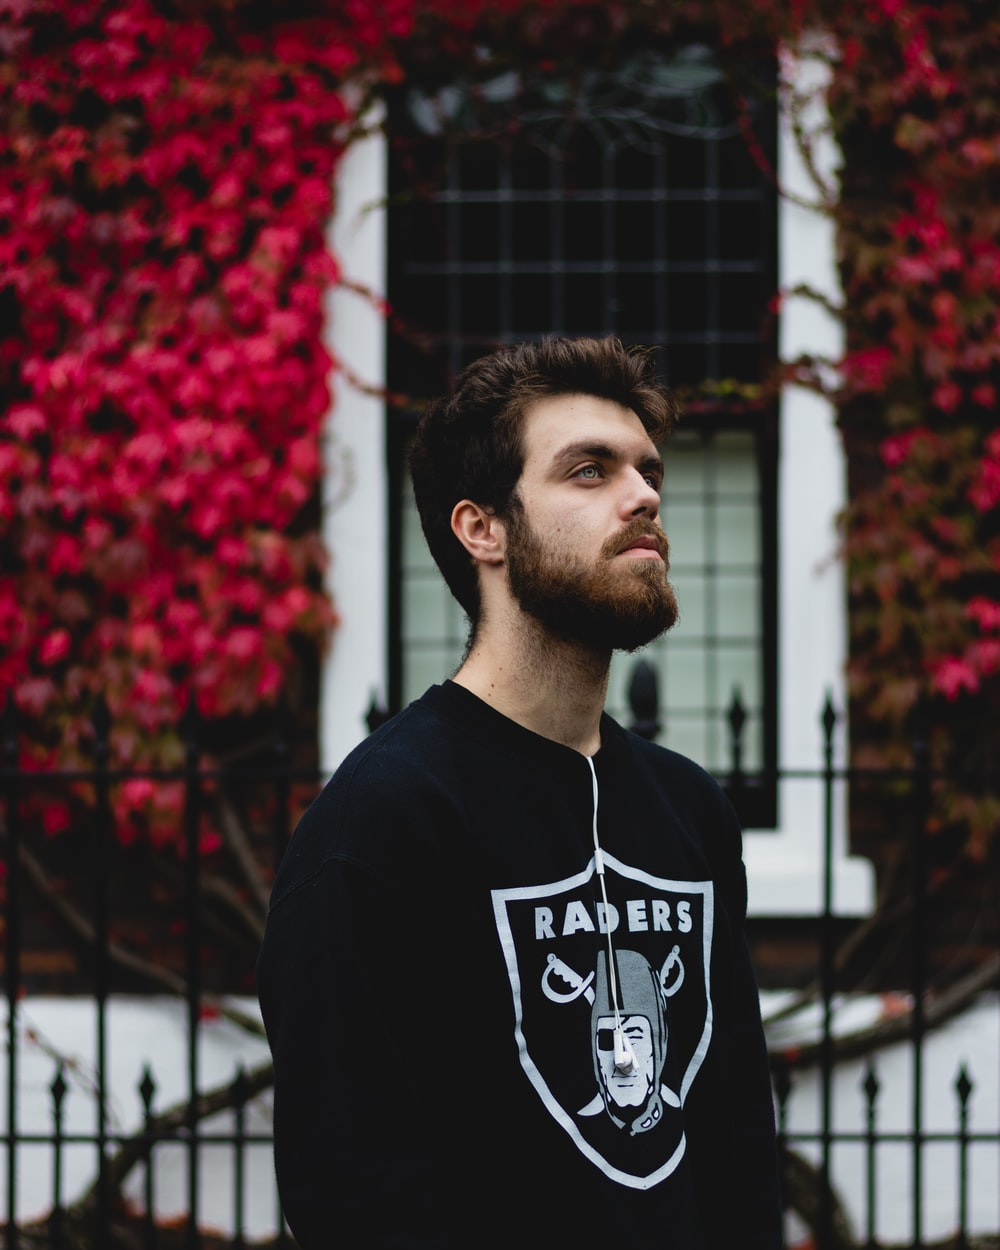 man in black Oakland Raiders long-sleeved shirt